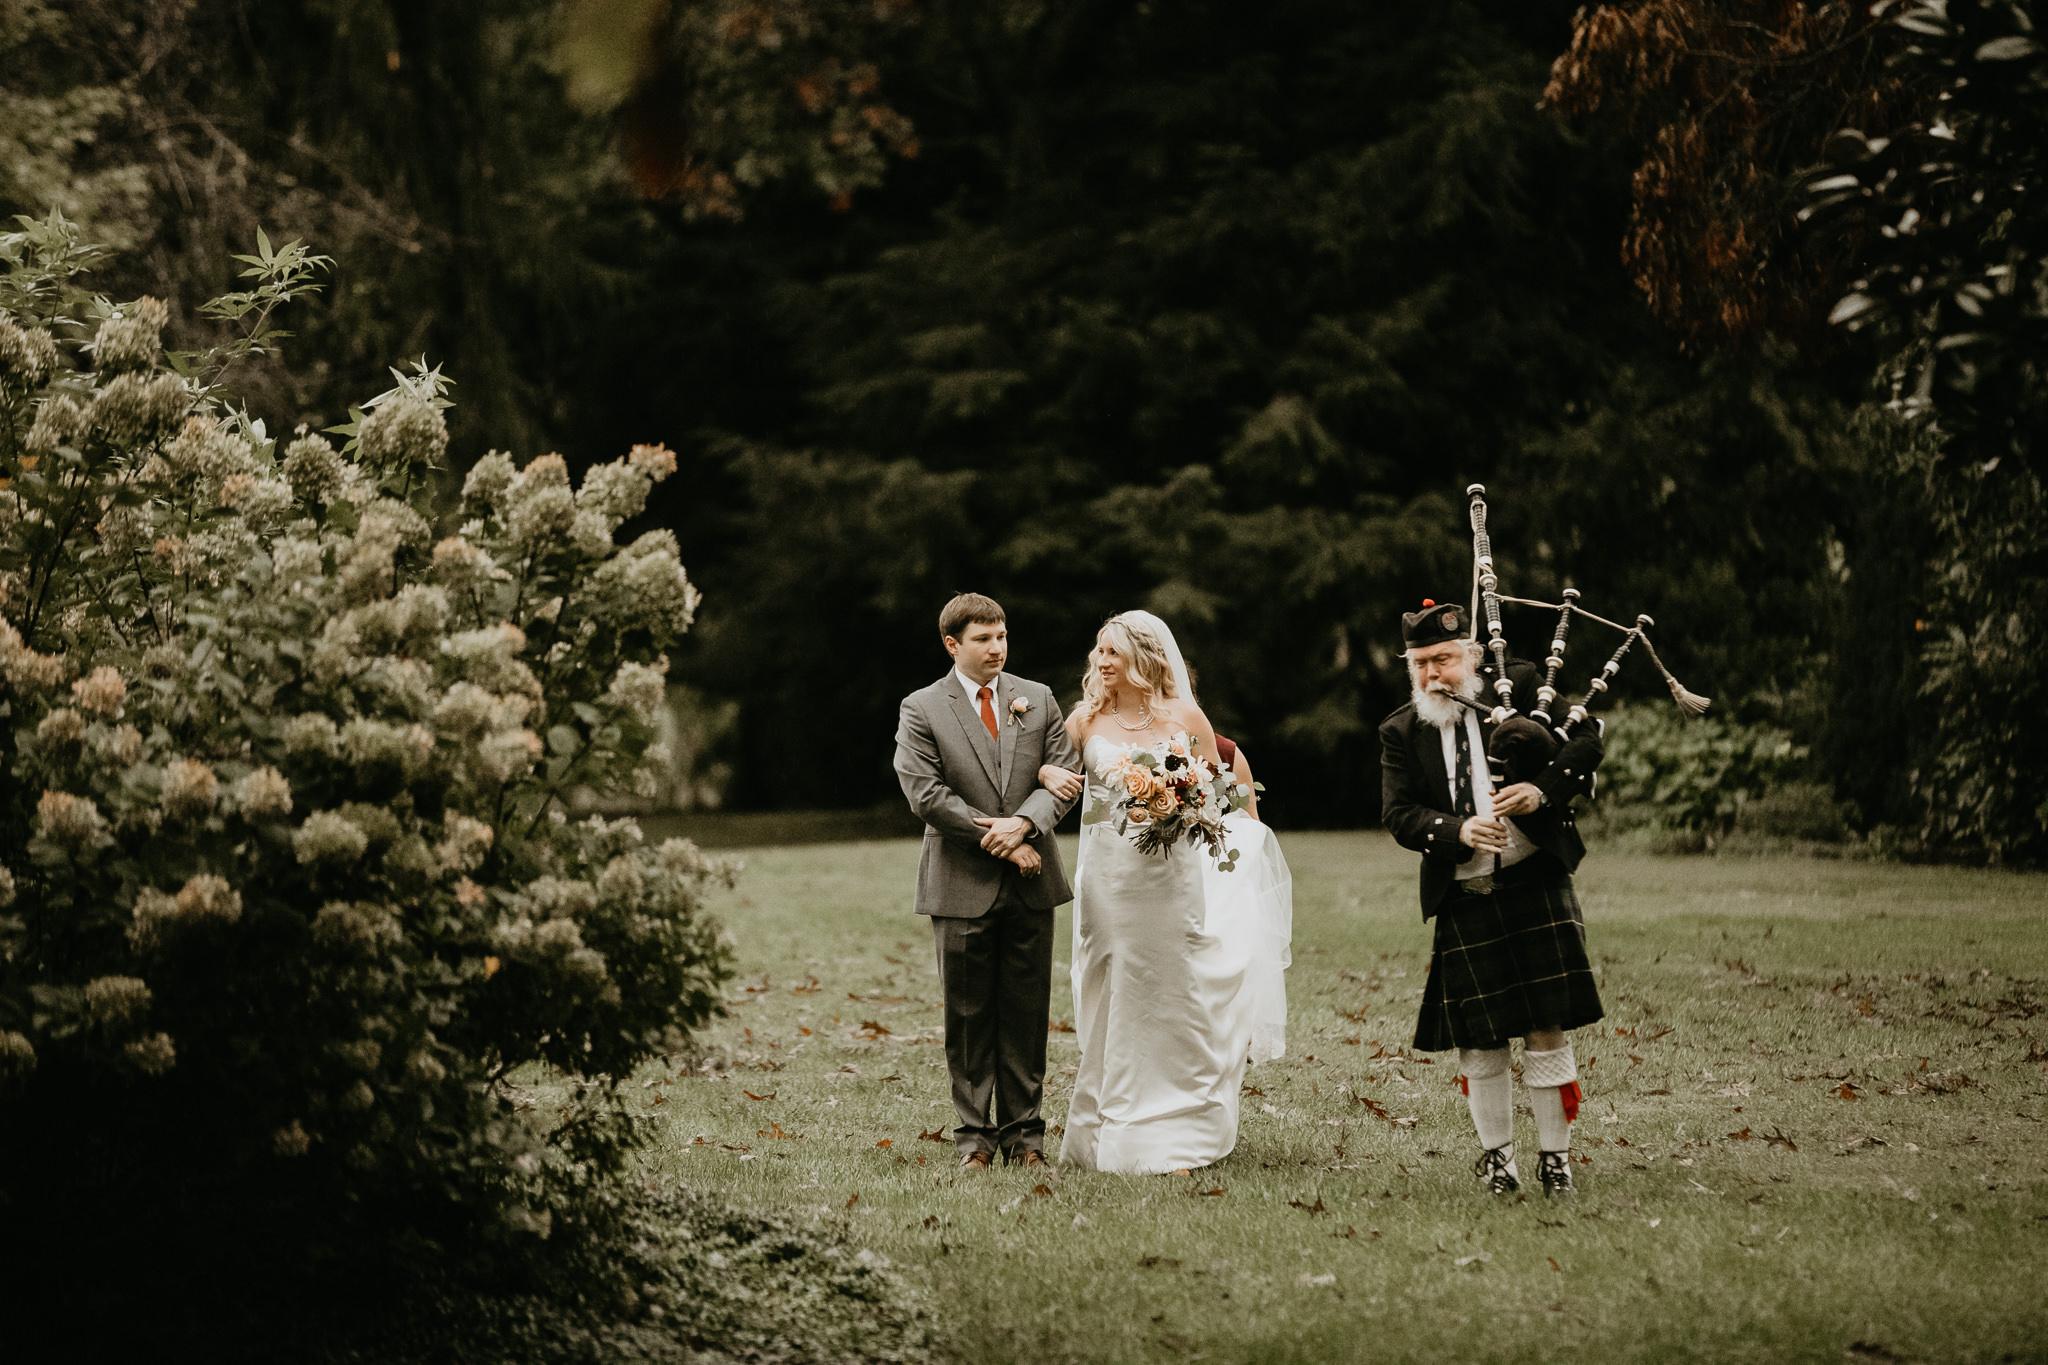 Sundara - Weddings - Virginia - Best Wedding Photographer - Pat Cori Photography-42.jpg